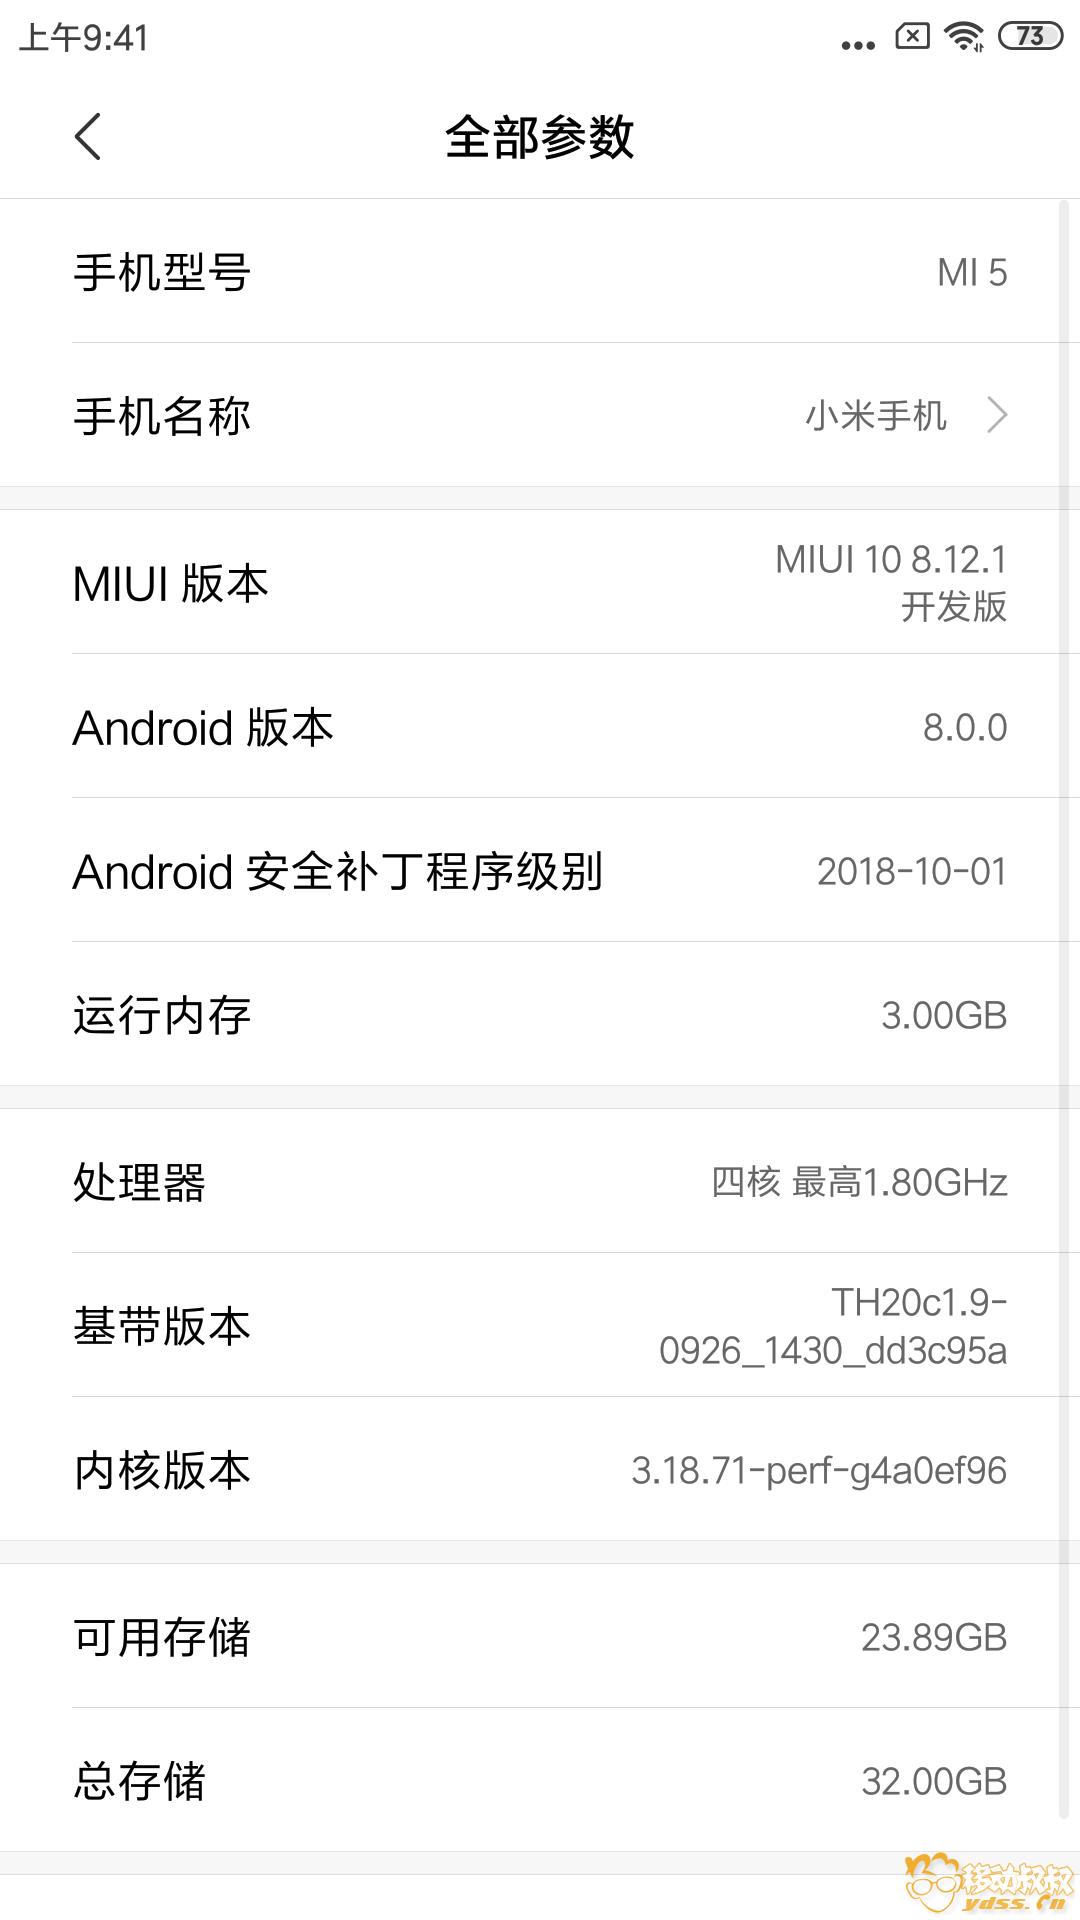 Screenshot_2018-12-01-09-41-29-279_com.android.settings.png